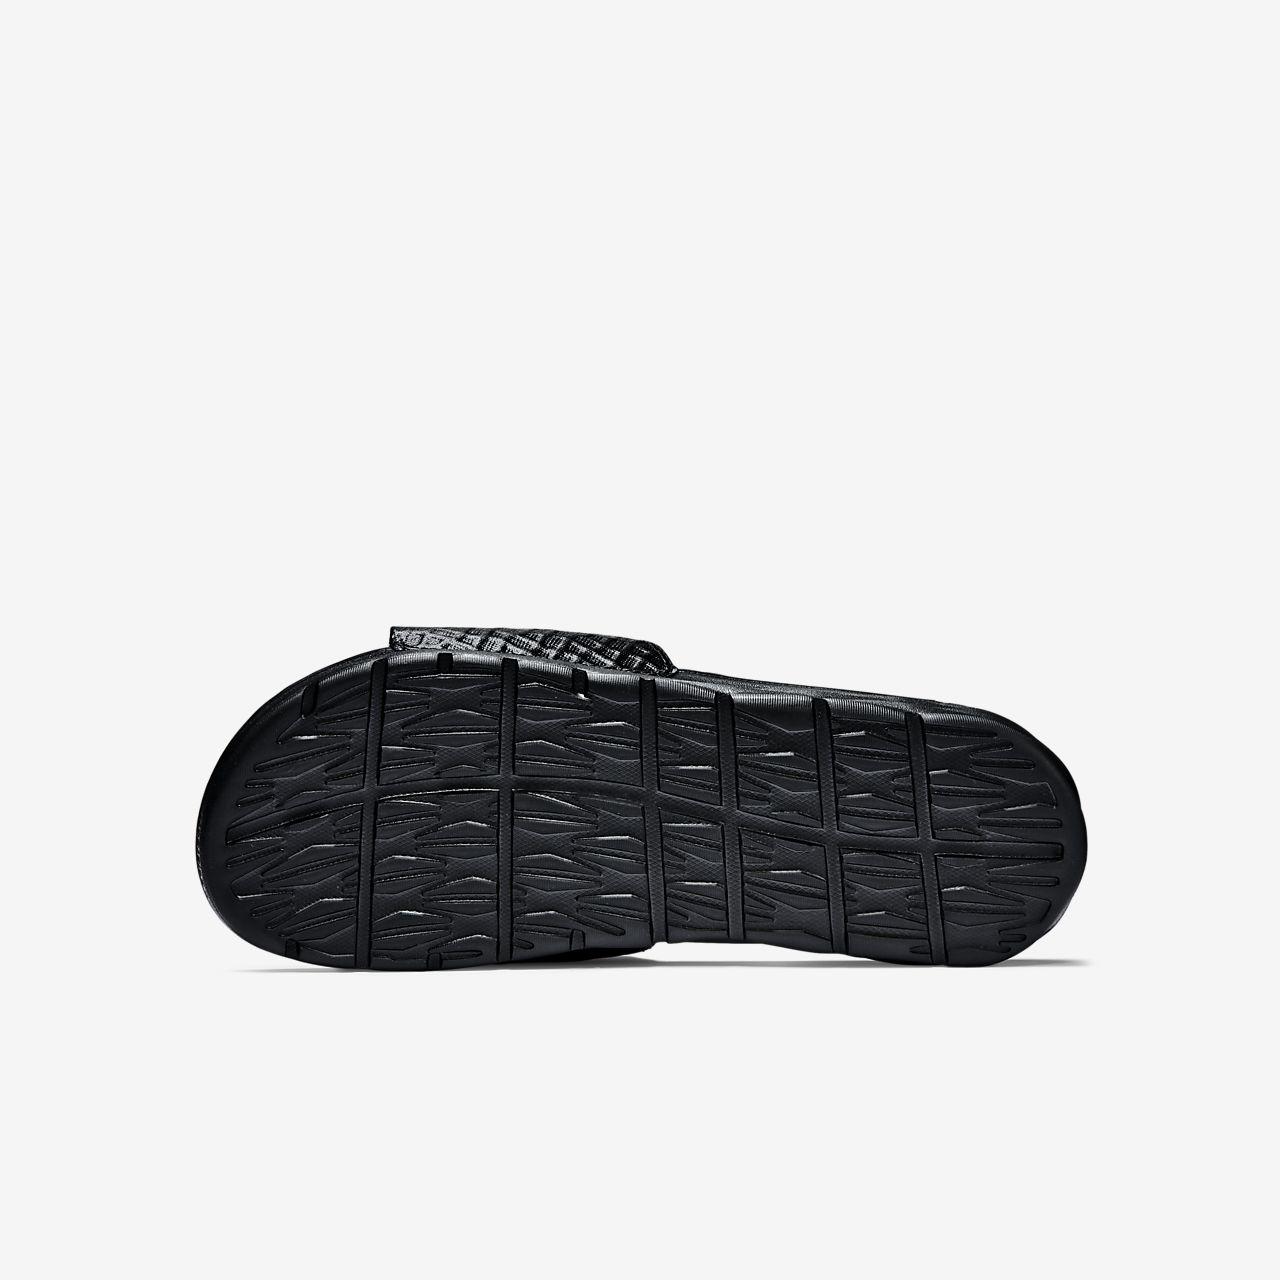 d0b2c414c7bd2 Nike Benassi Solarsoft 2 Men s Slide. Nike.com